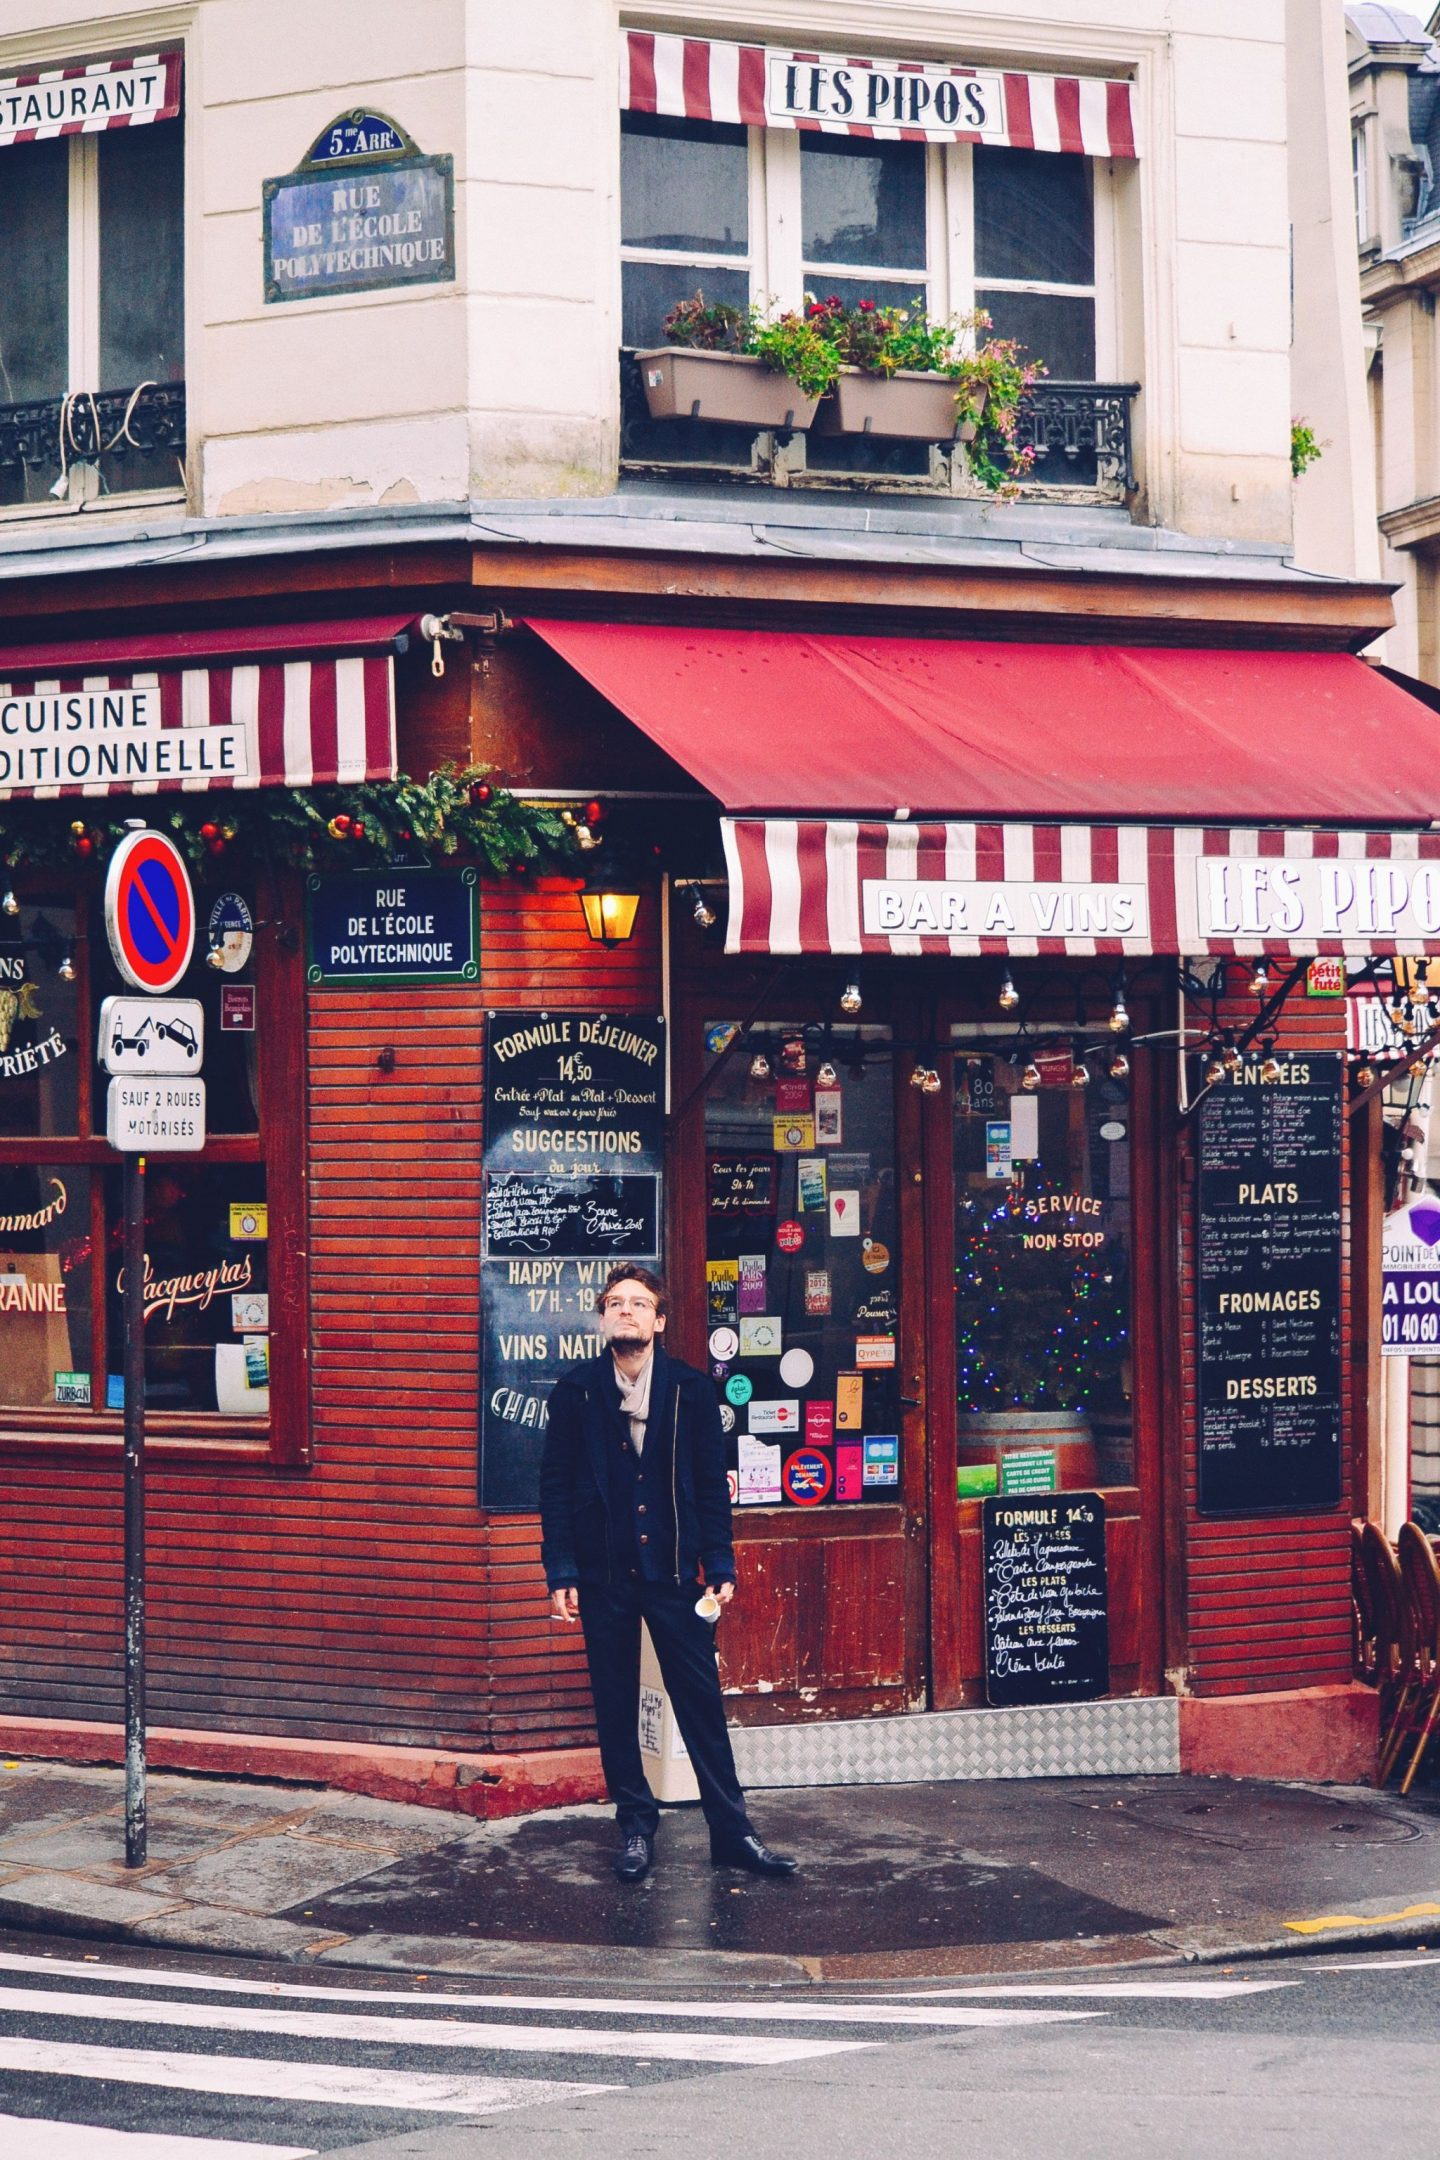 restaurant, store, shop, quartier latin, paris, food, budget